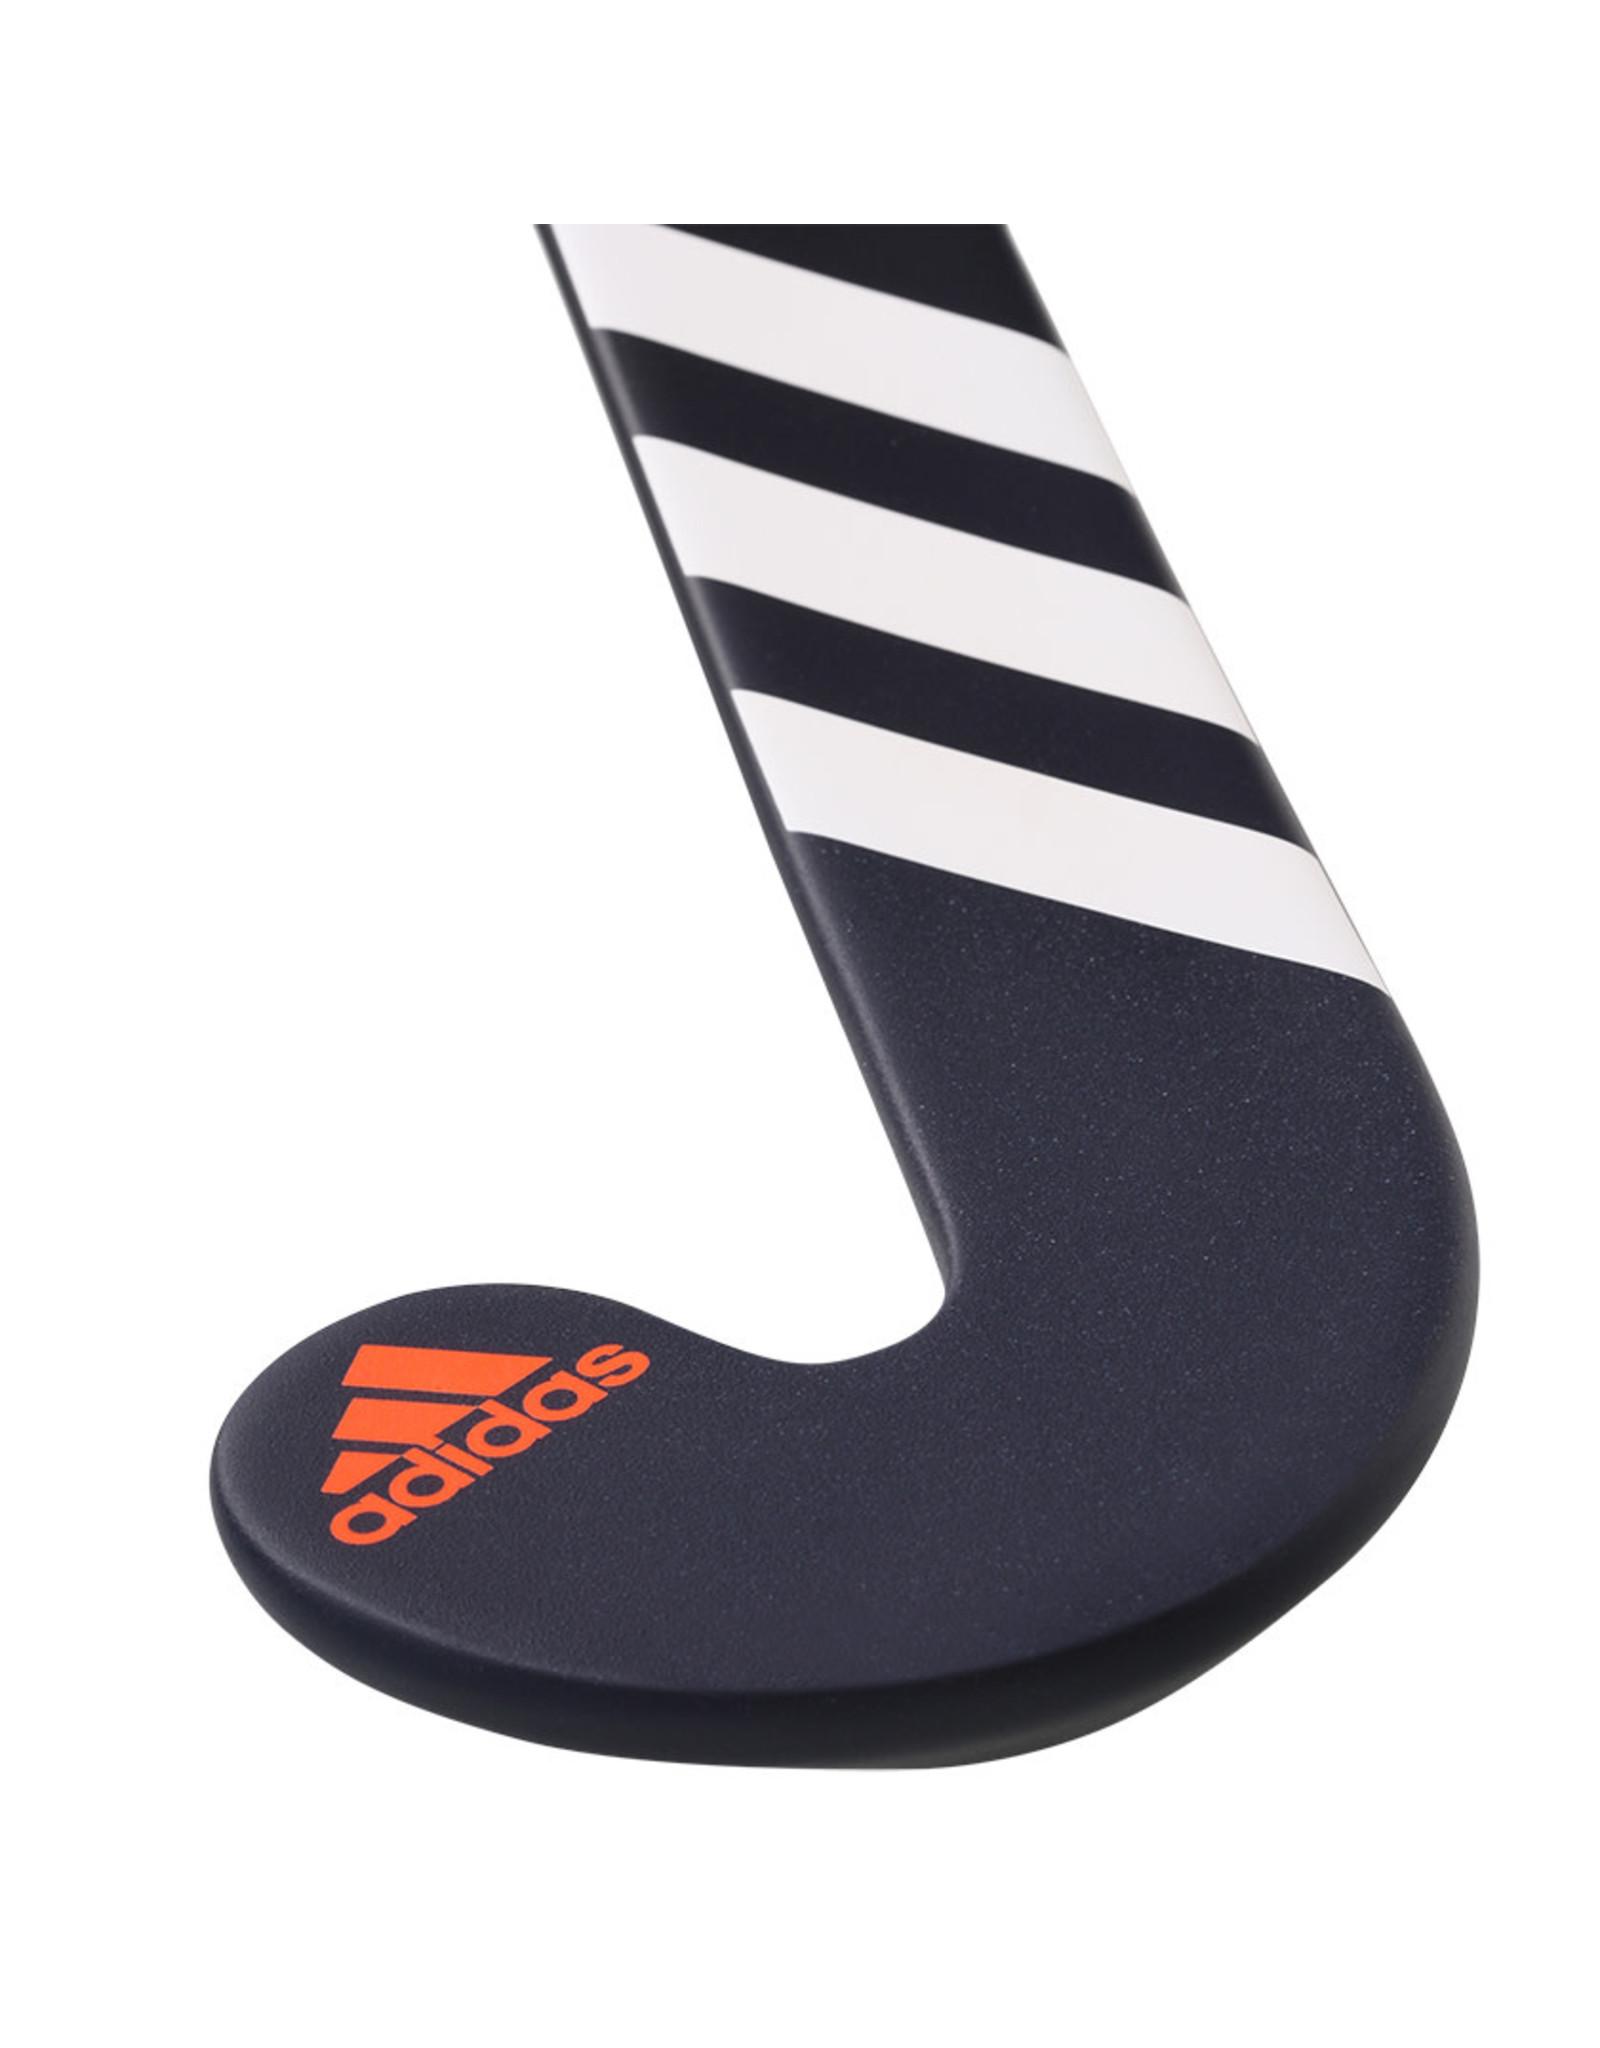 Adidas LX COMPO 1